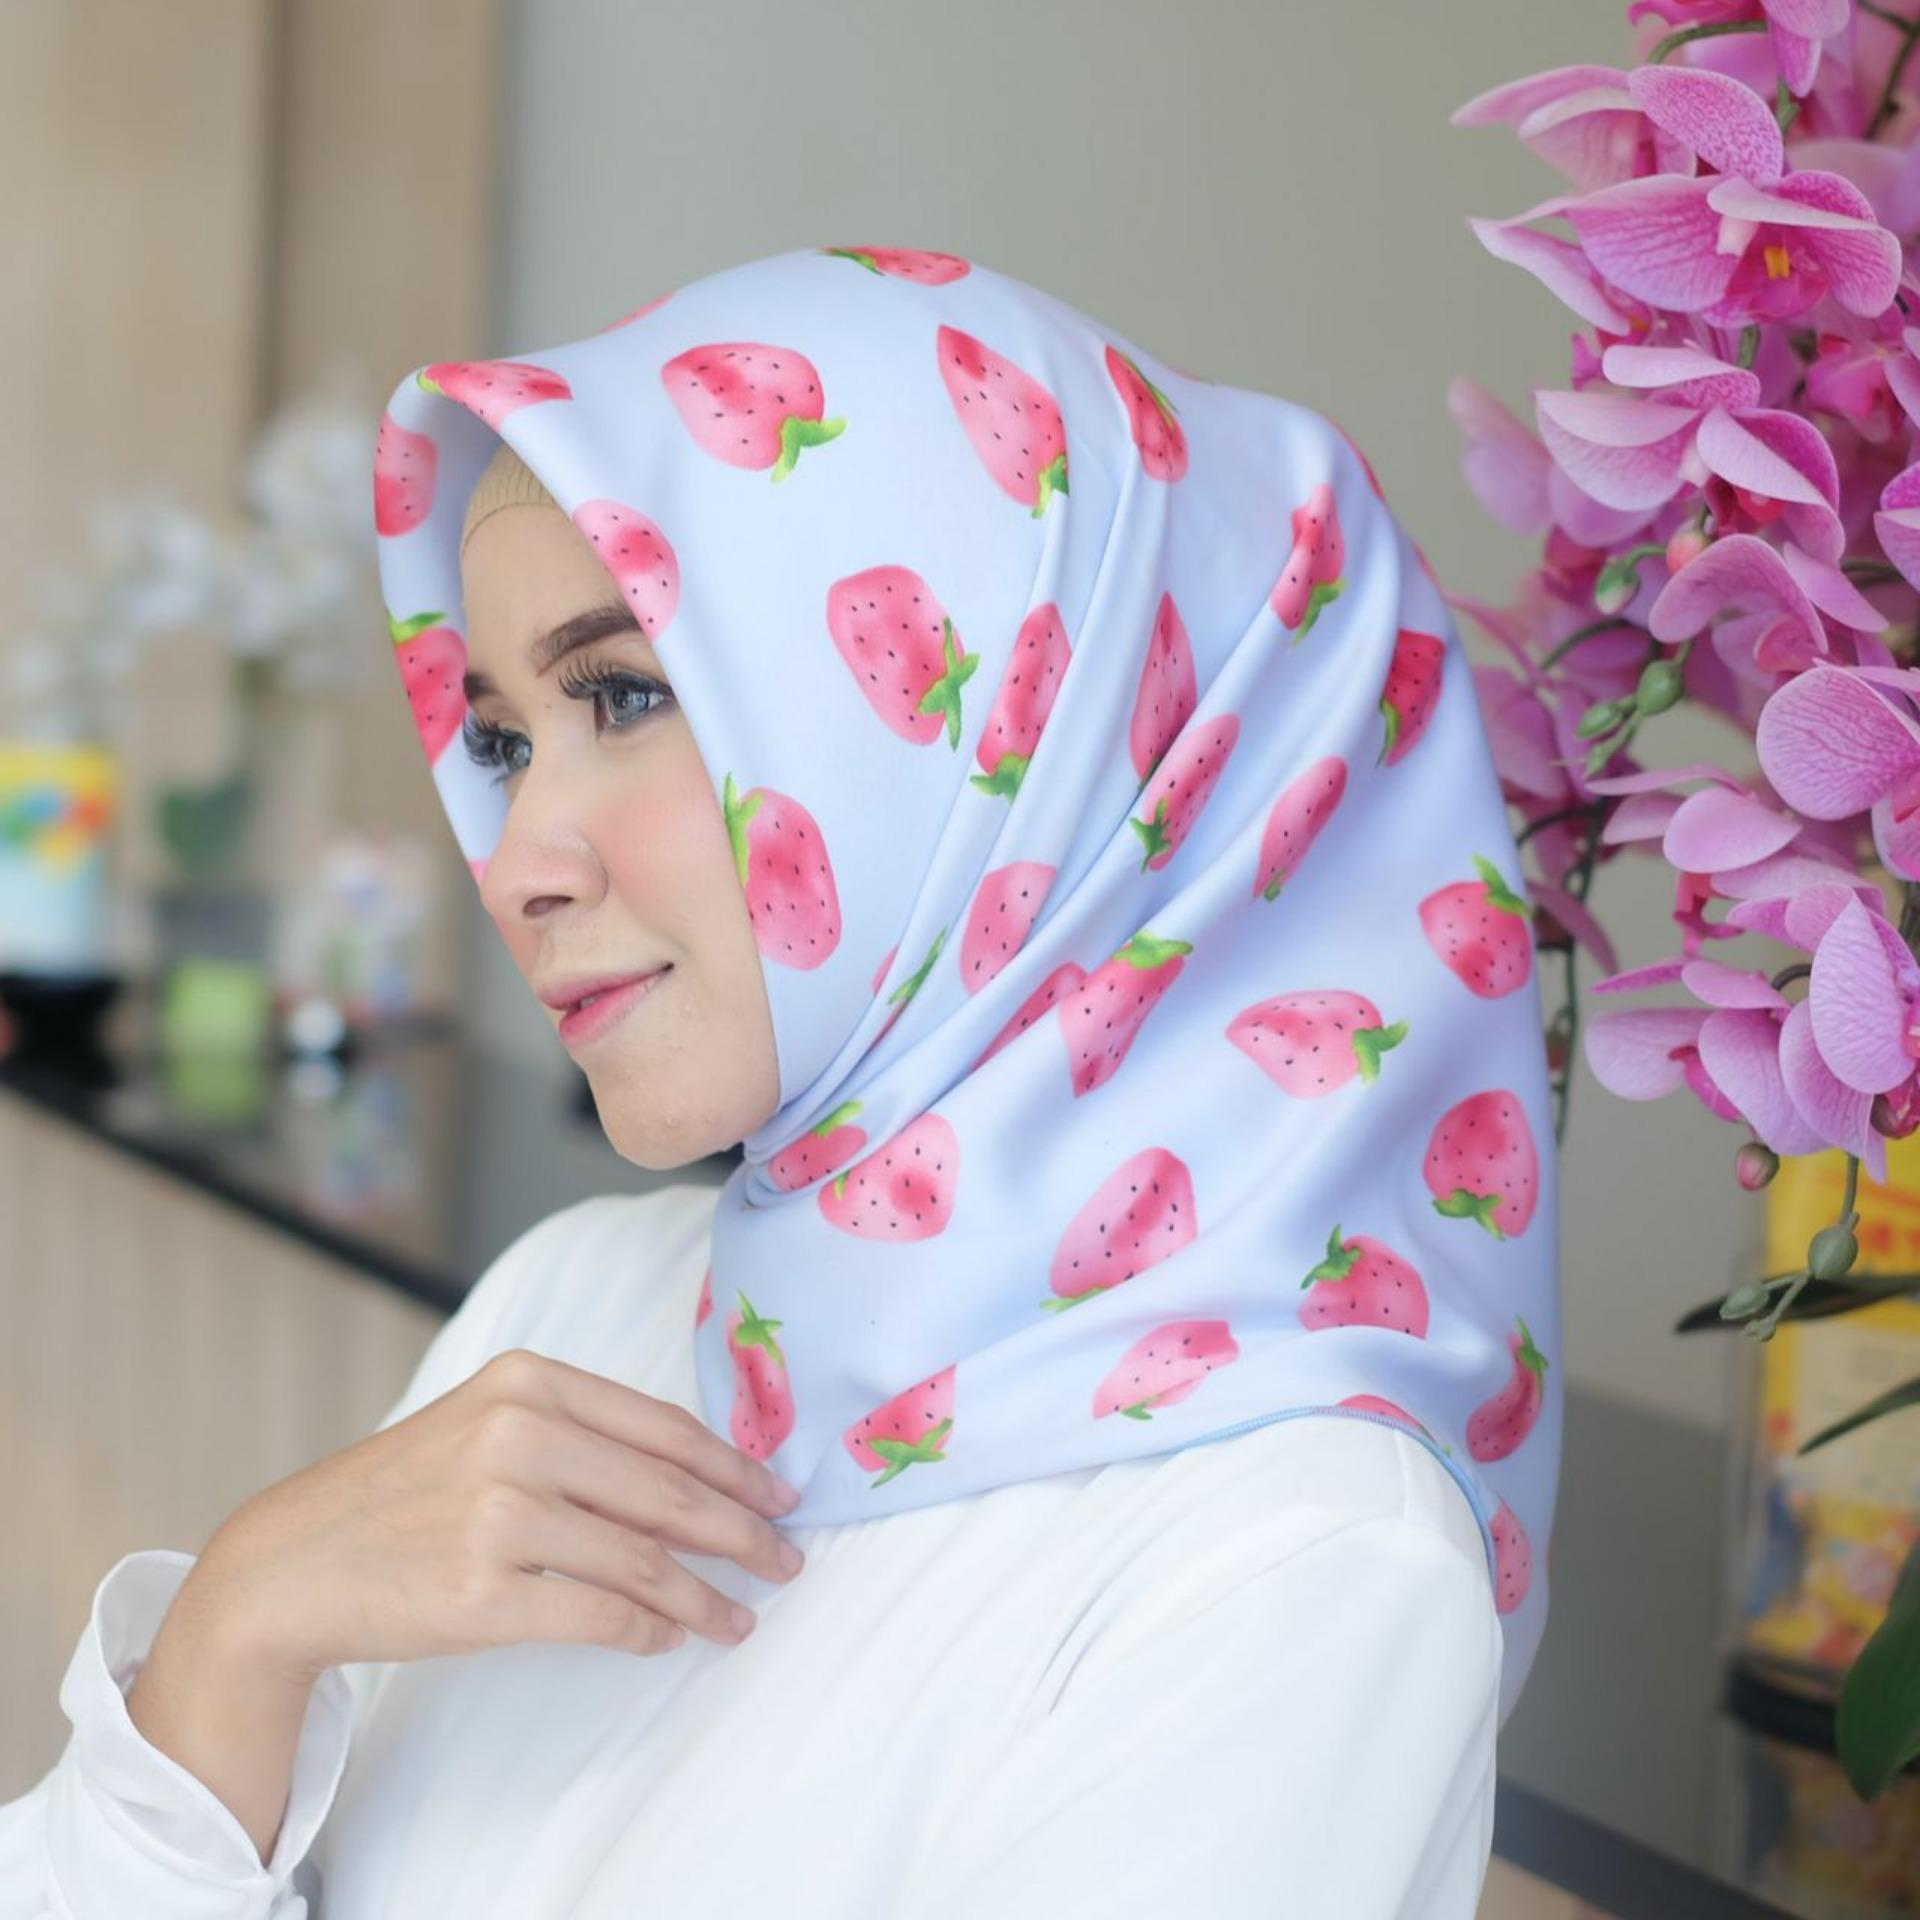 Harga Jilbab Velvet Terbaru 2018 Web Segiempat Hijab Kerudung Segi Empat Silk Strawberry